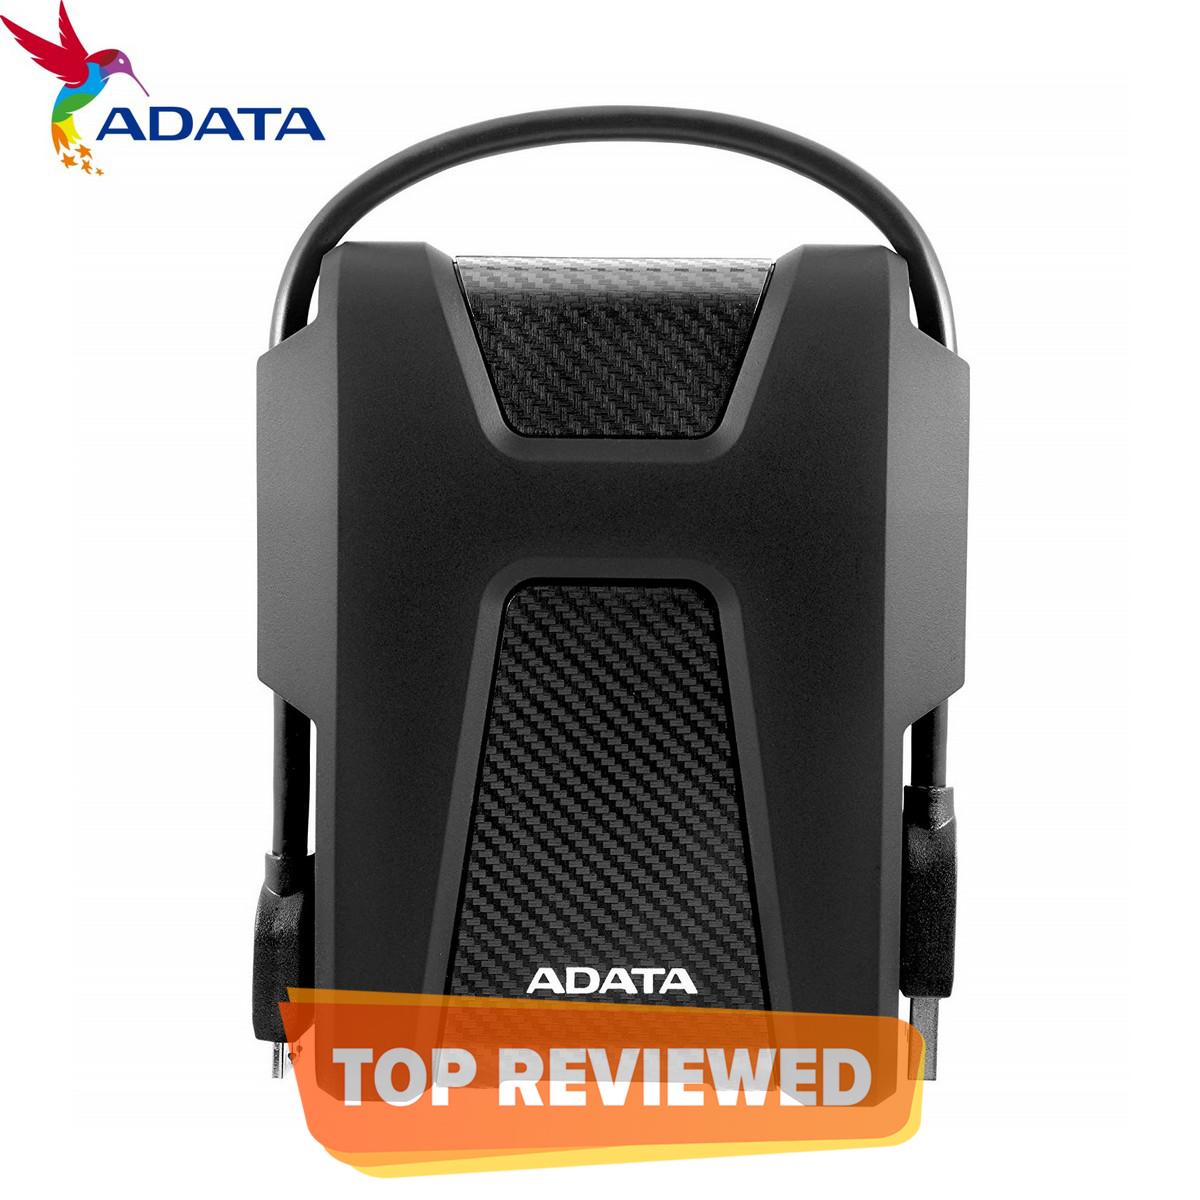 ADATA 2TB HD680 USB 3.2 Gen1 Military-Grade Shock-Proof External Portable Hard Drive Black